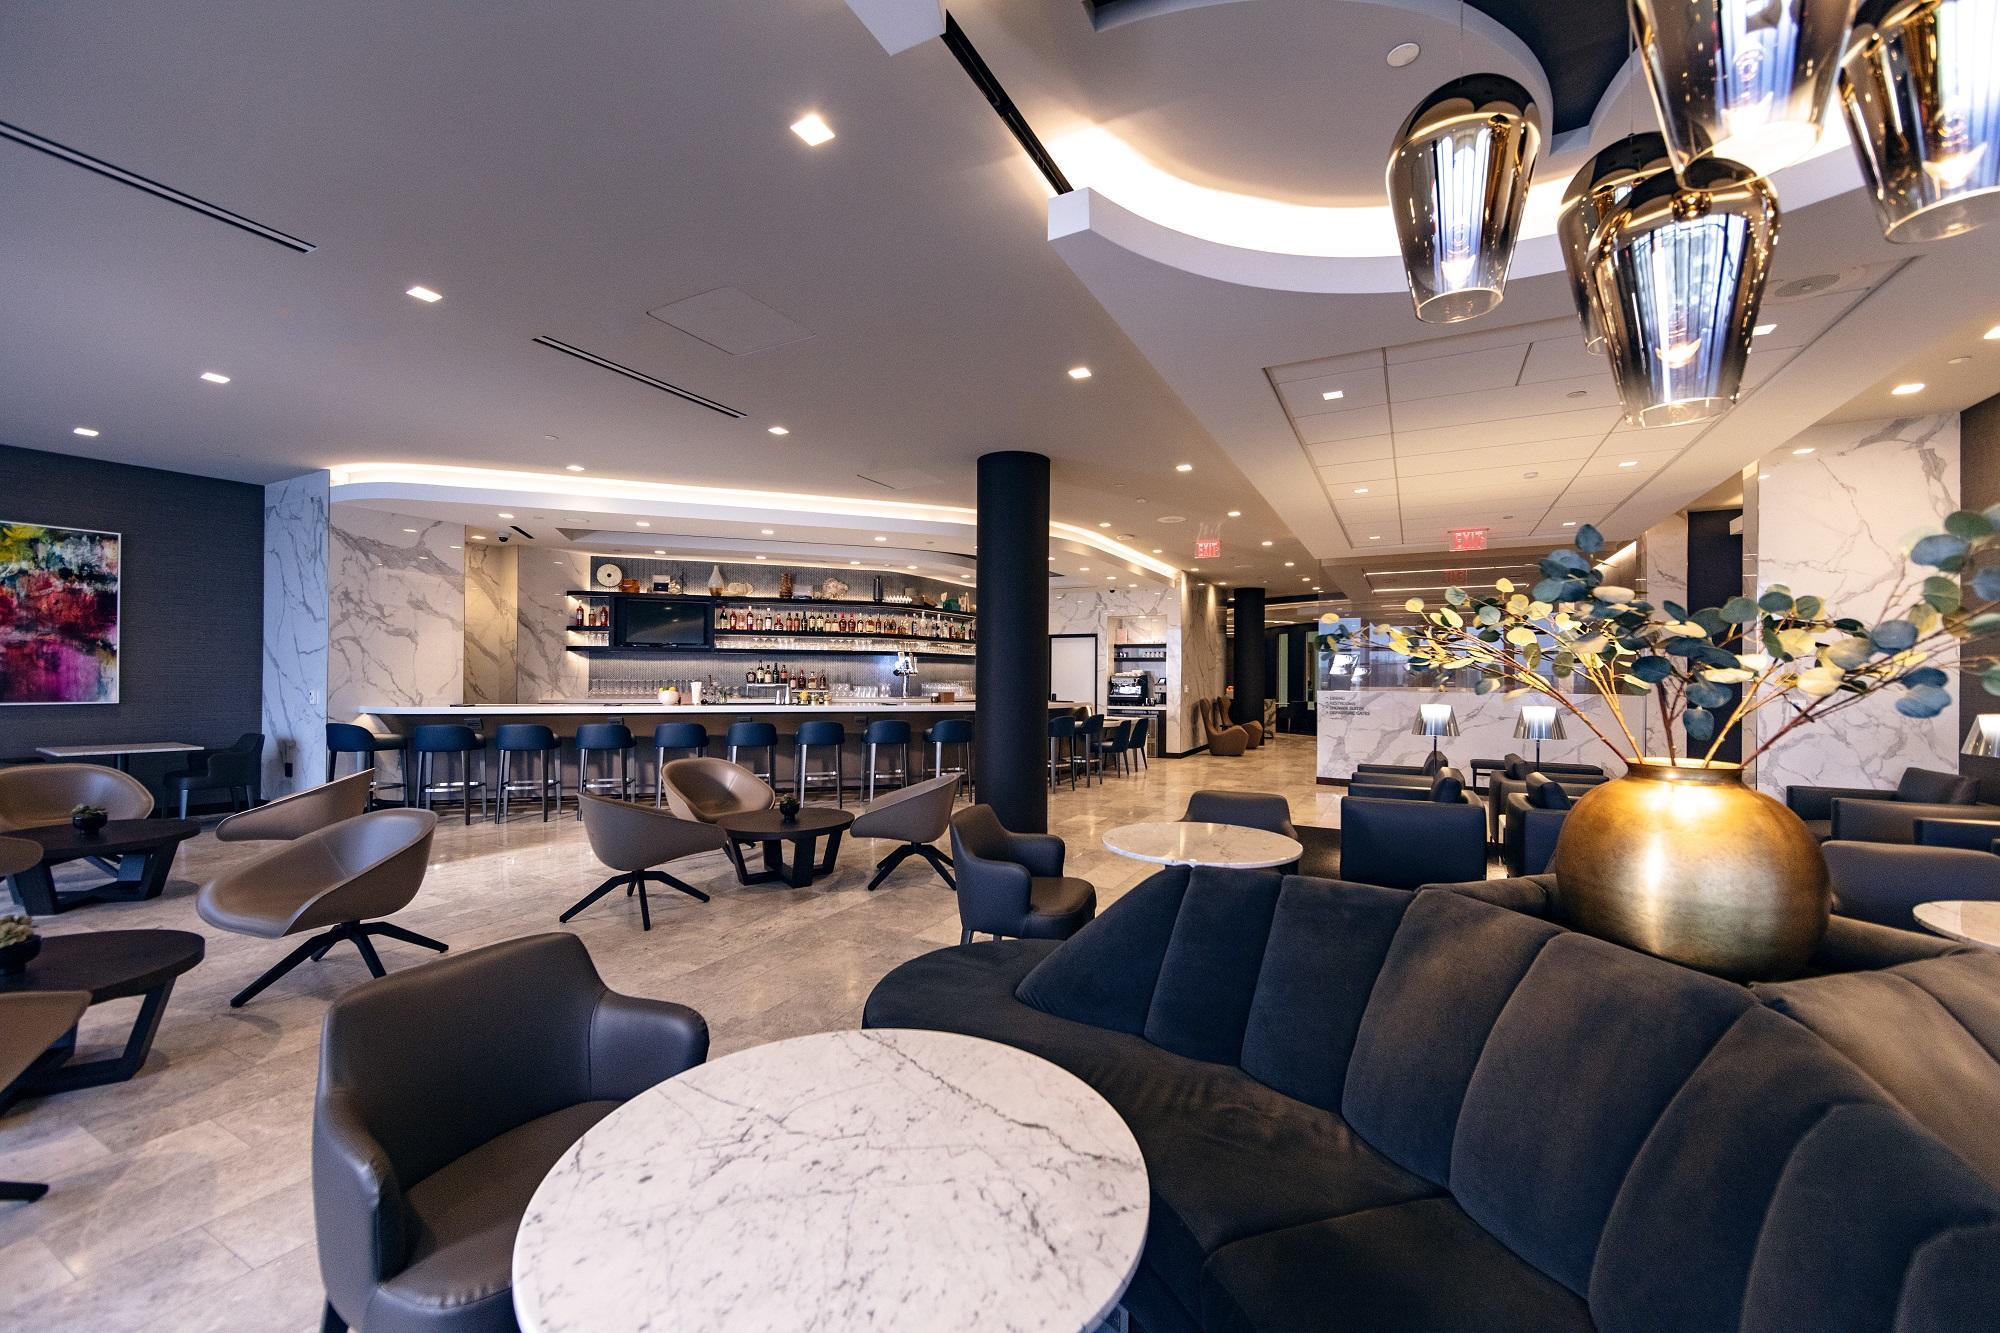 United Polaris lounge seating area at LAX